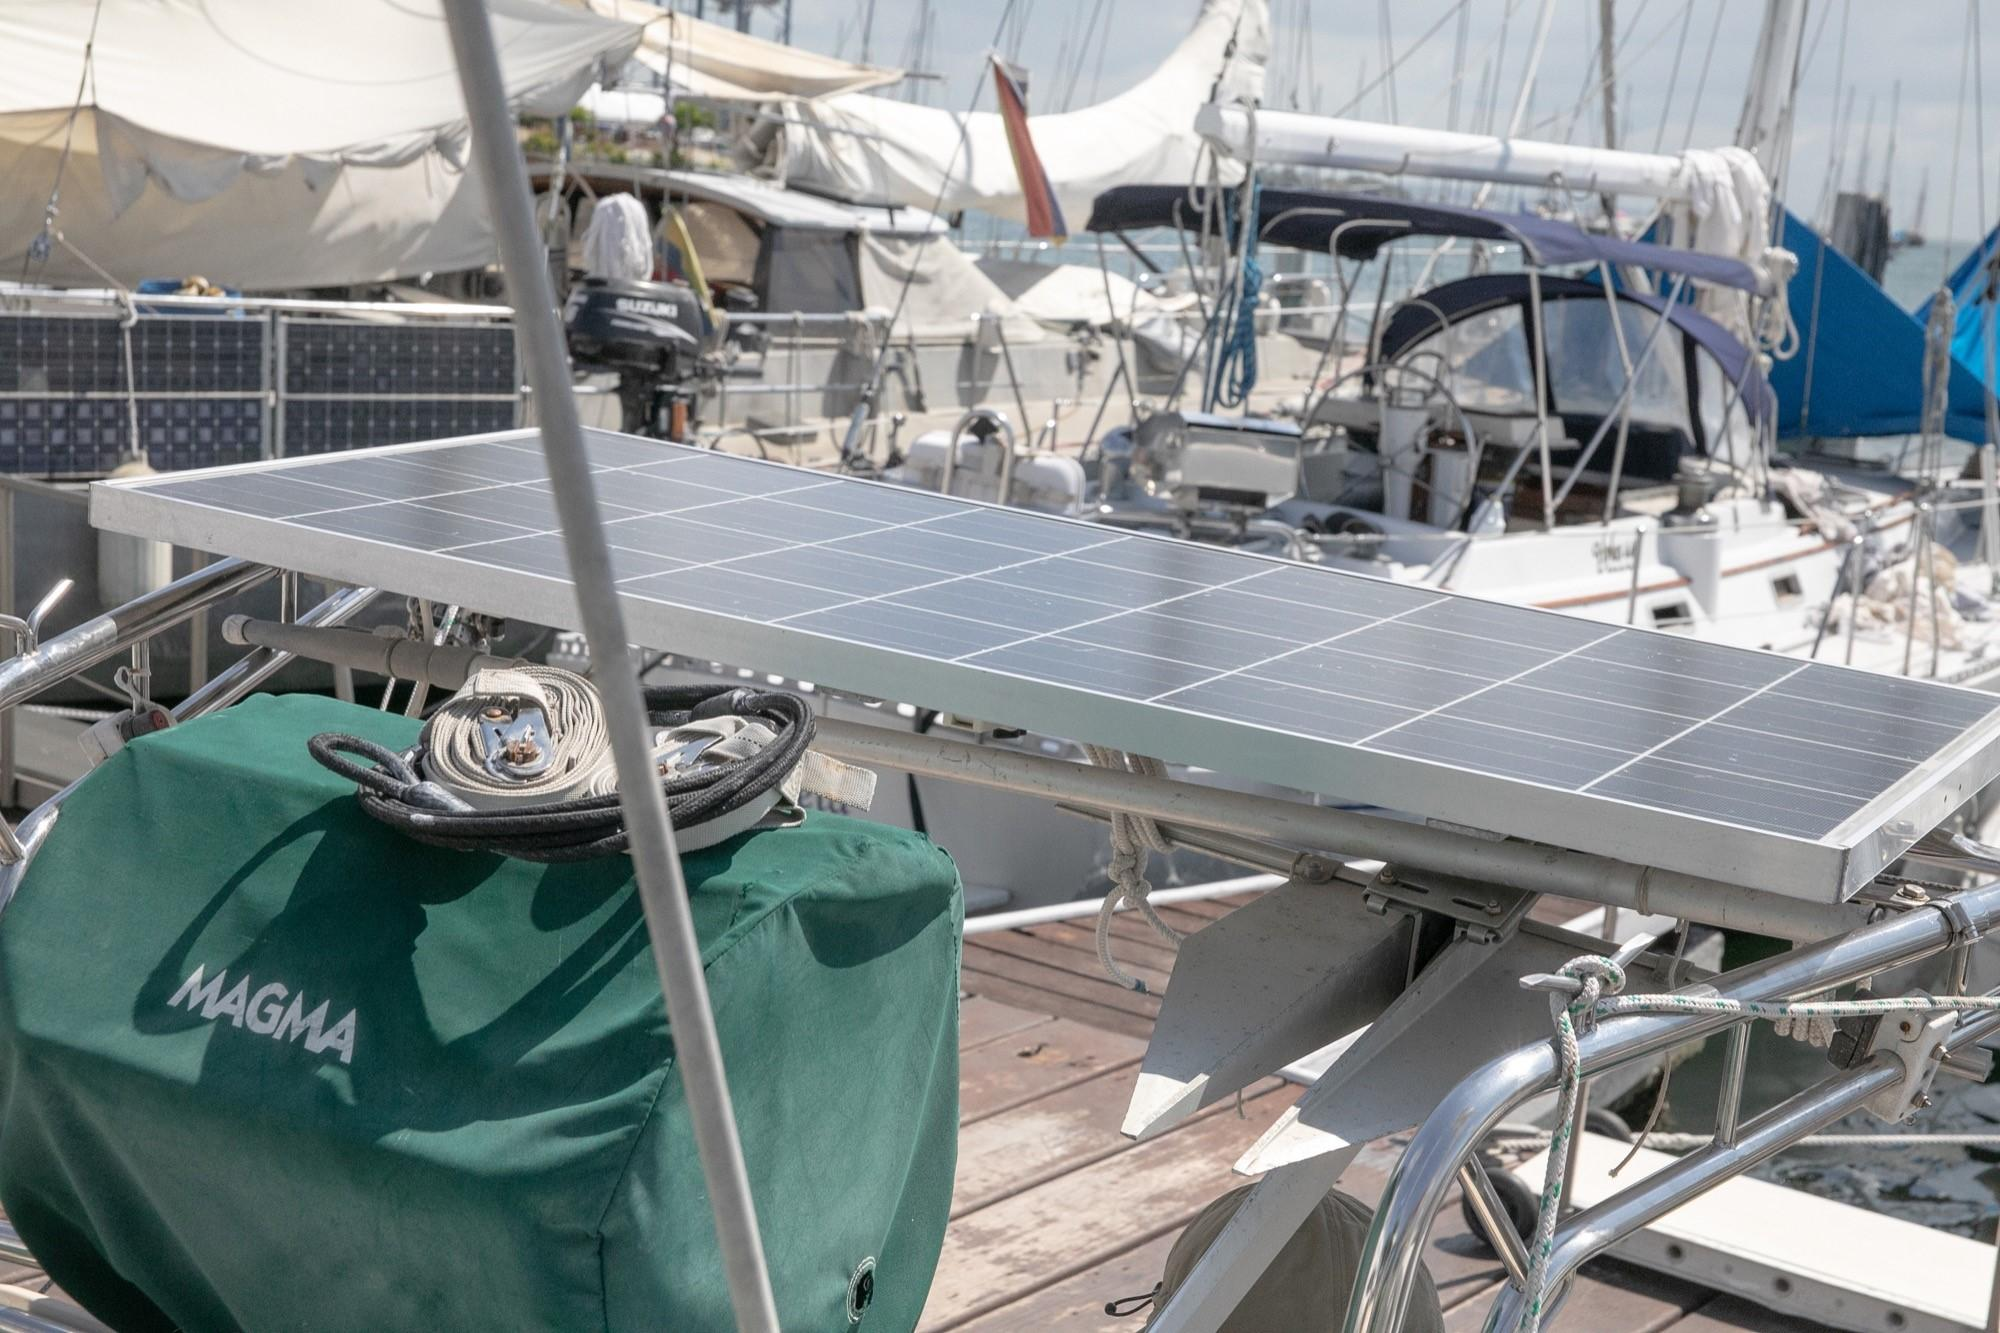 1 of 3 solar panels